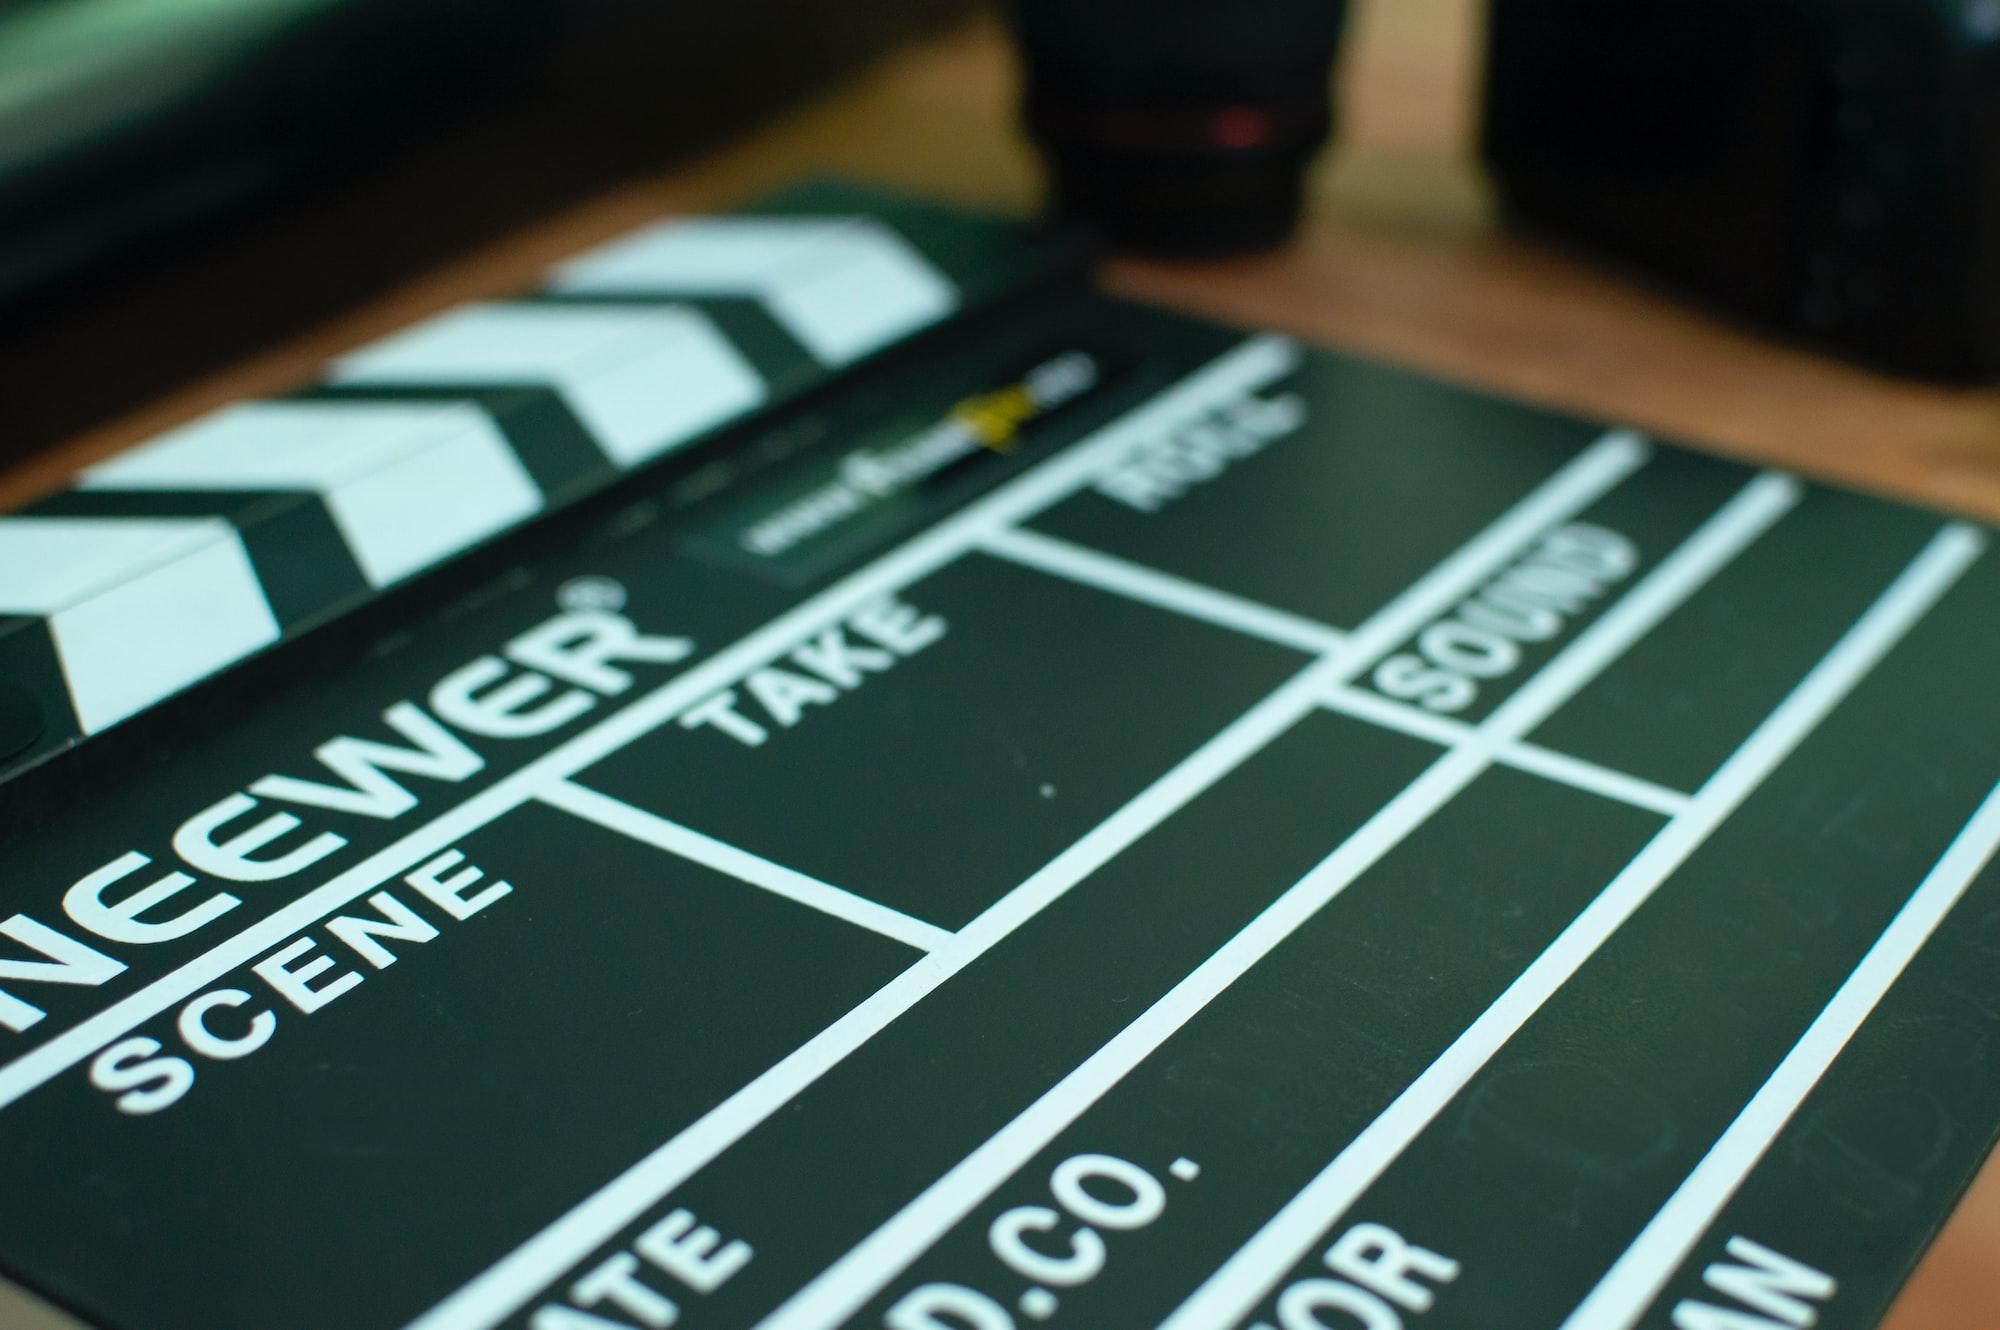 Media on ContentGrow are seeking scriptwriters for social media videos